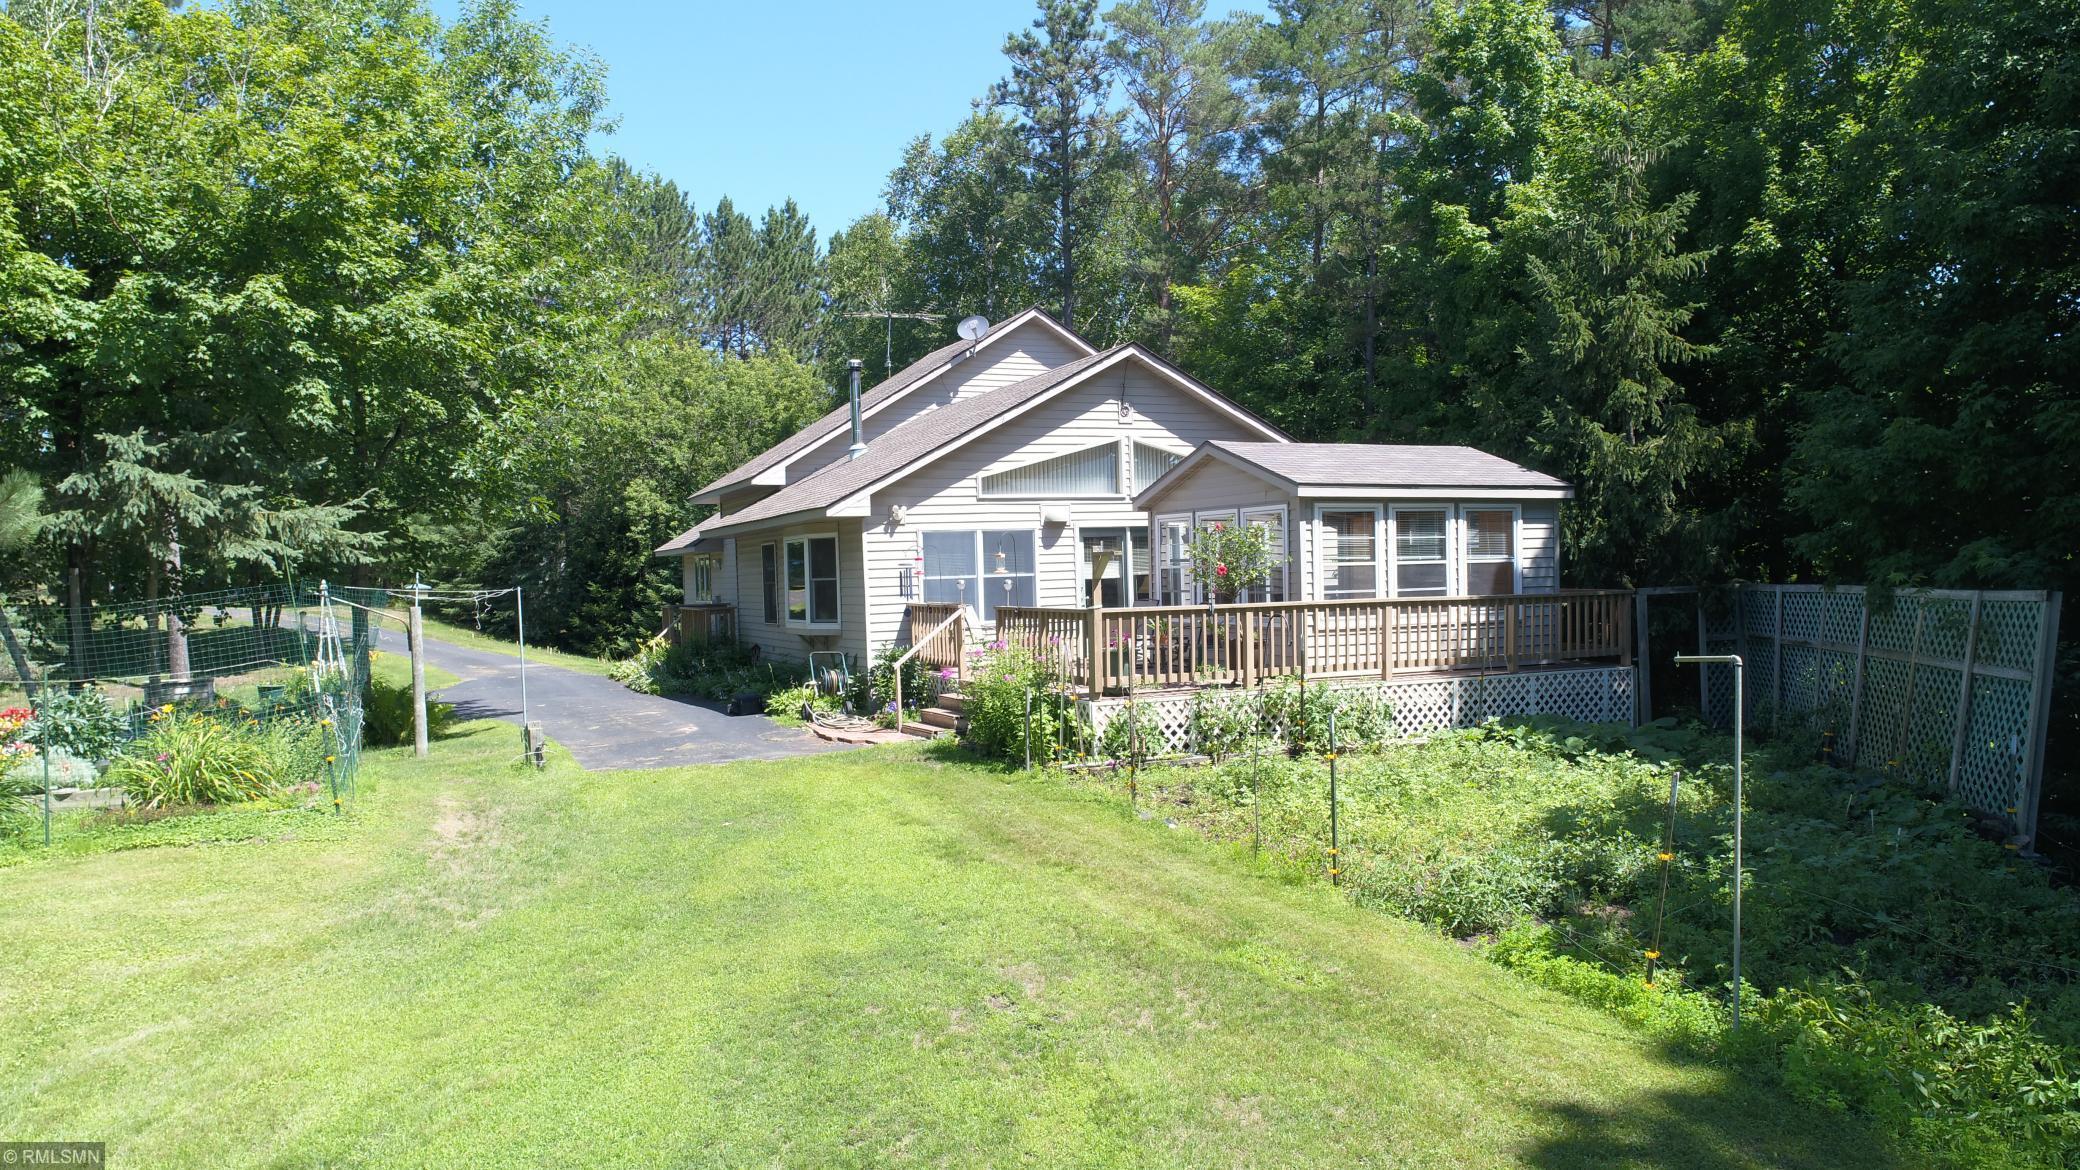 13596 Sprandel Road Property Photo - Finlayson, MN real estate listing